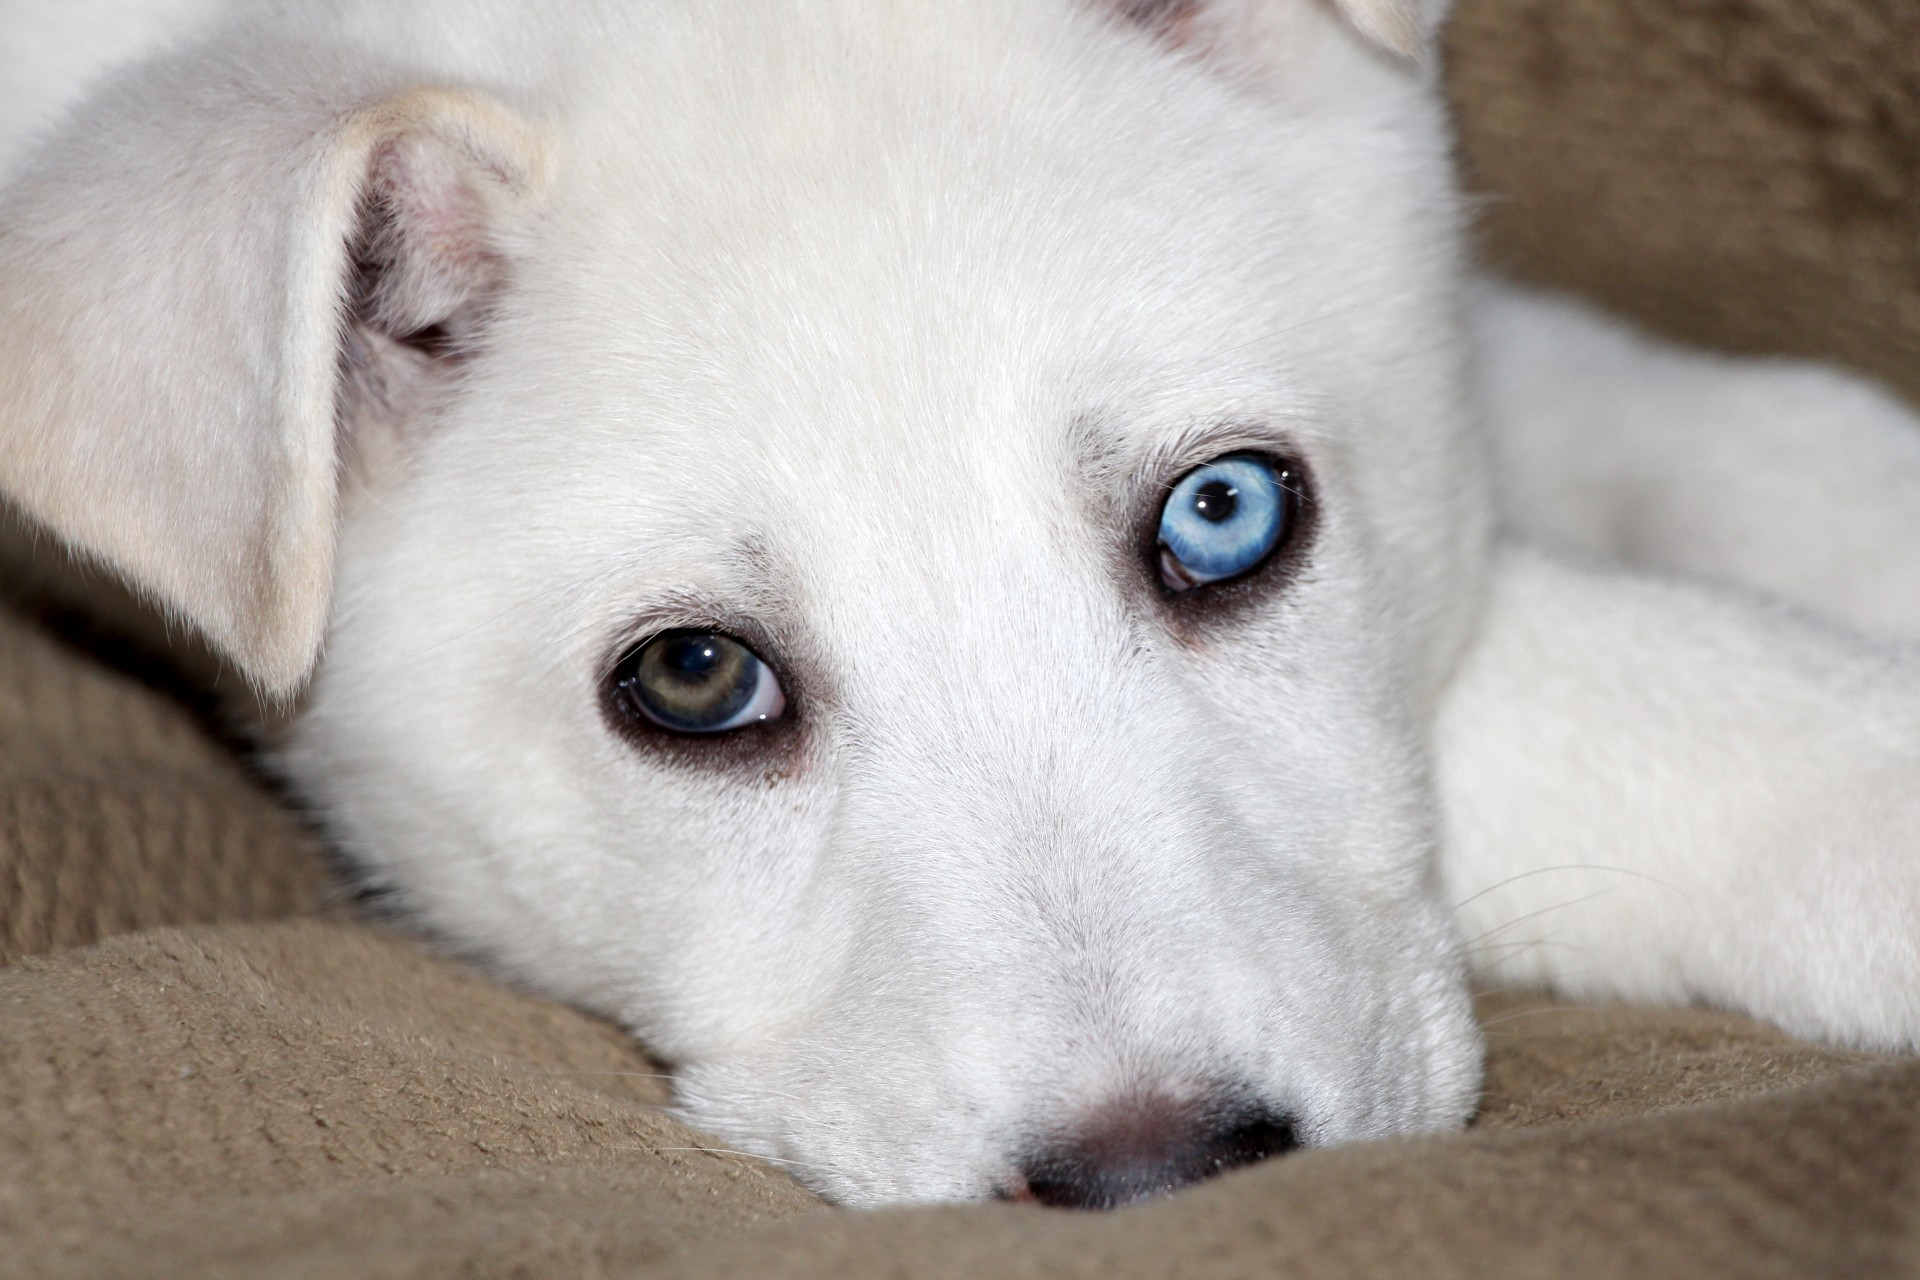 Blue eye,brown eye,husky,puppy,eyes - free photo from